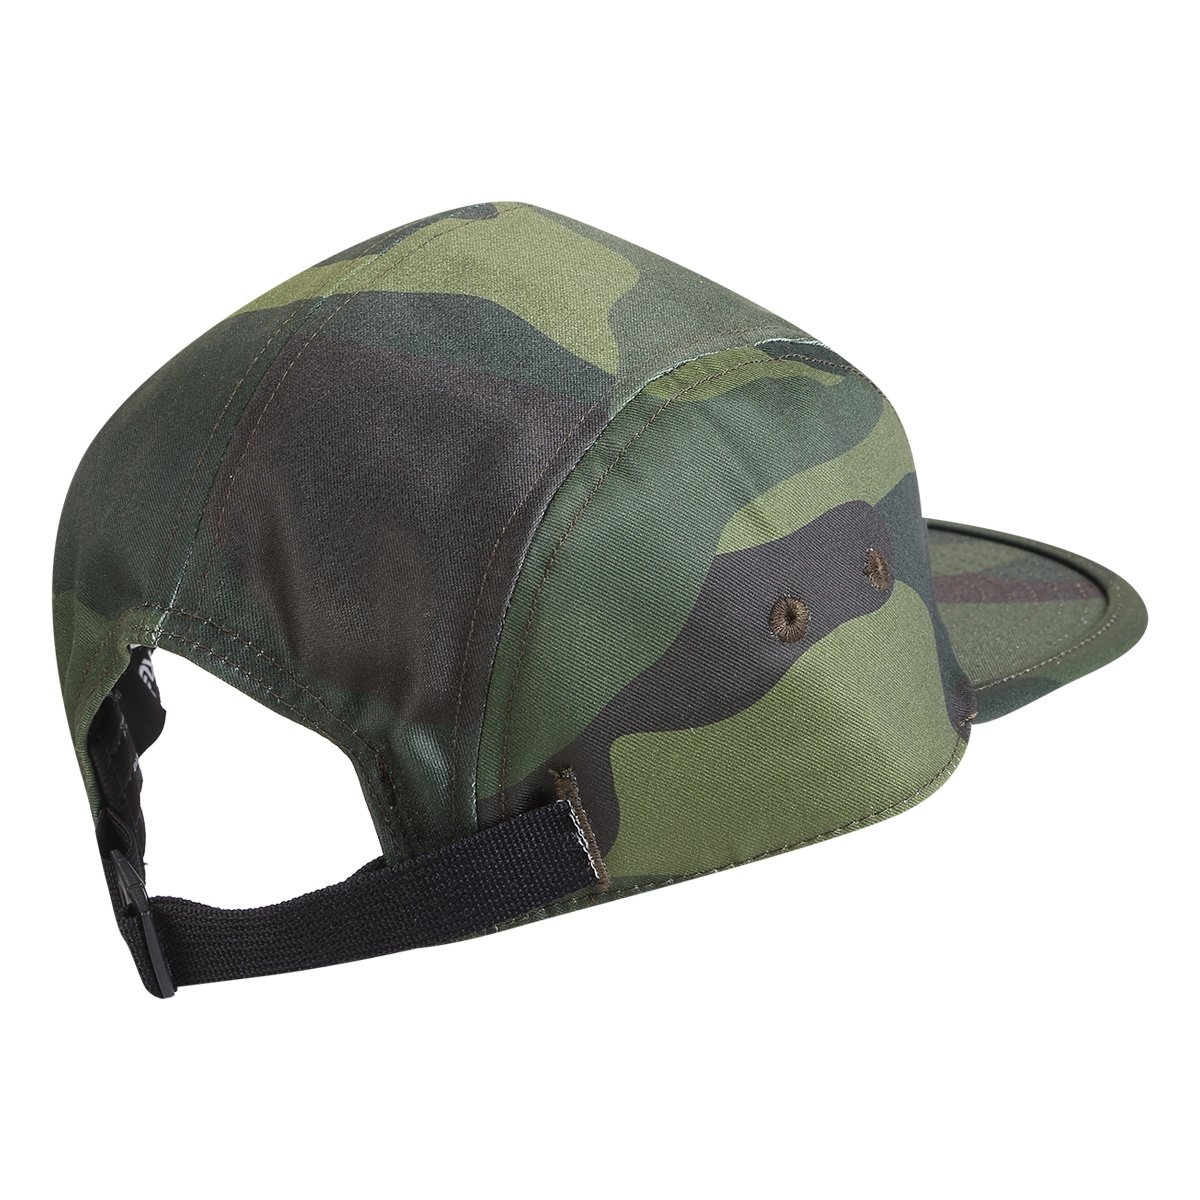 47ac279689509 Boné Oakley Aba Reta Mod 5 Panel Cotton Camuflado Hat - Shopping ...